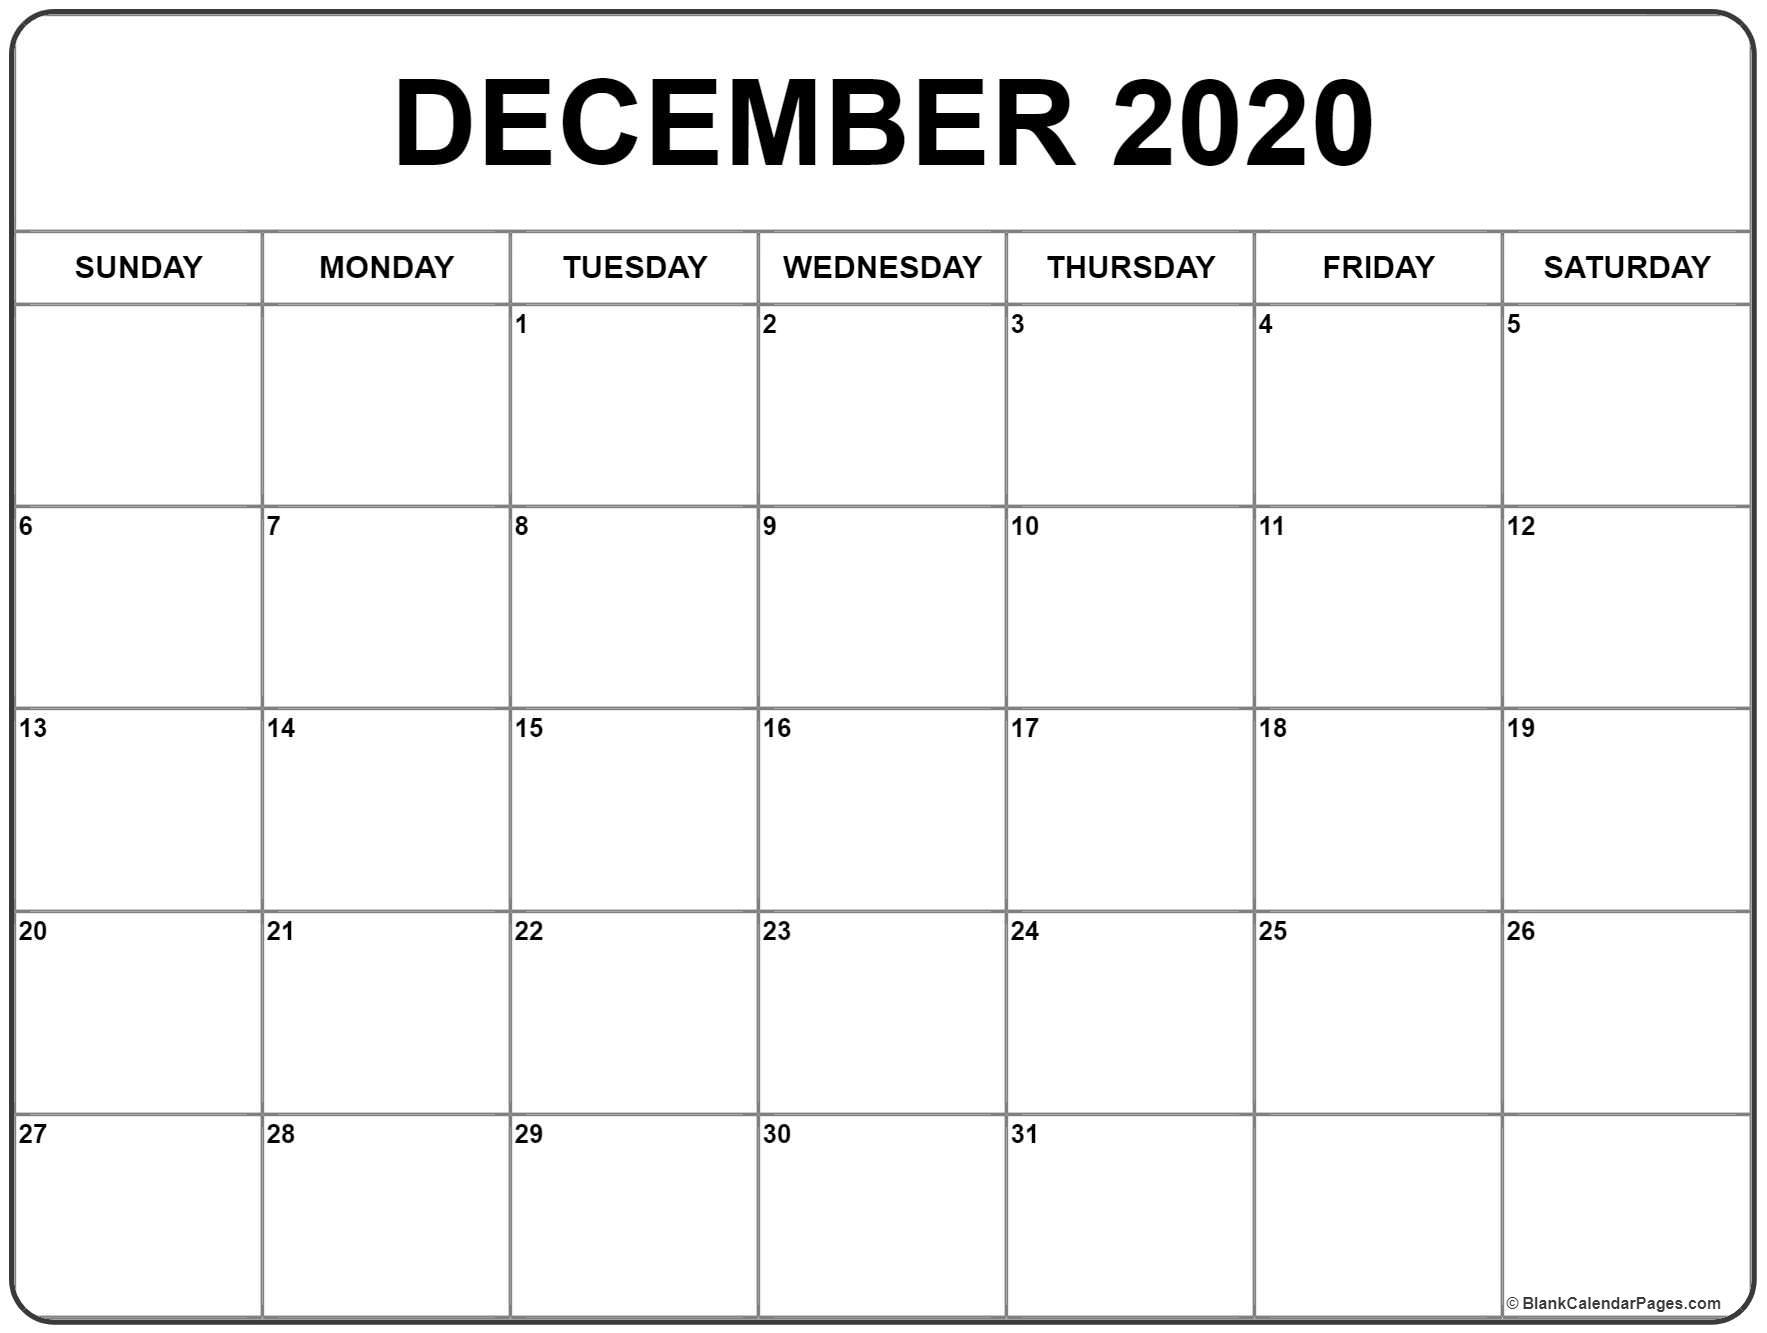 Free Calendar December 2020  Yatay.horizonconsulting.co for December 2020 Calendar Beta Calendars